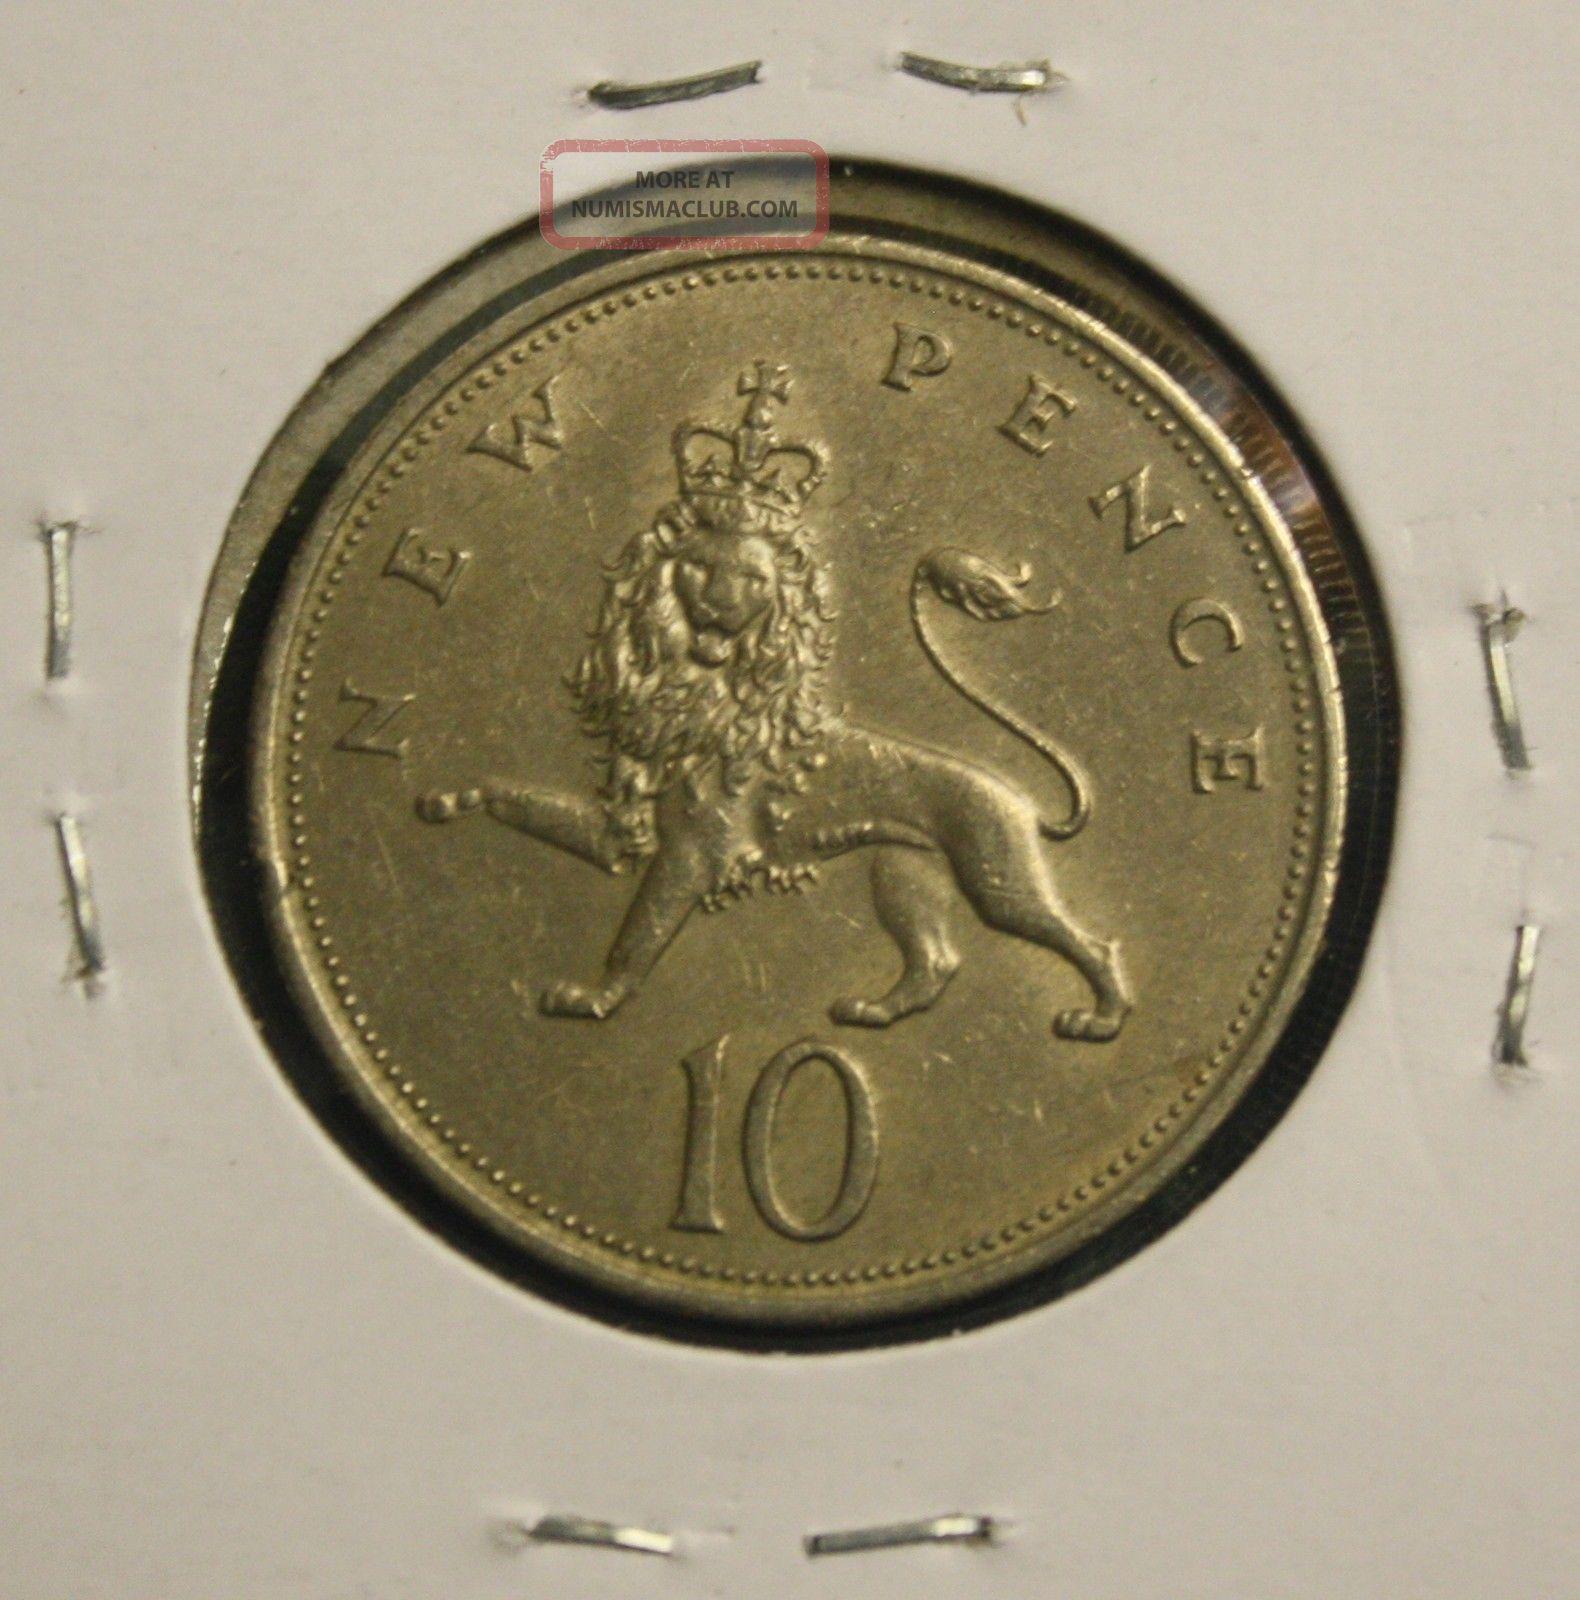 1968 Great Britain - Uk - 10 - Pence Coin UK (Great Britain) photo